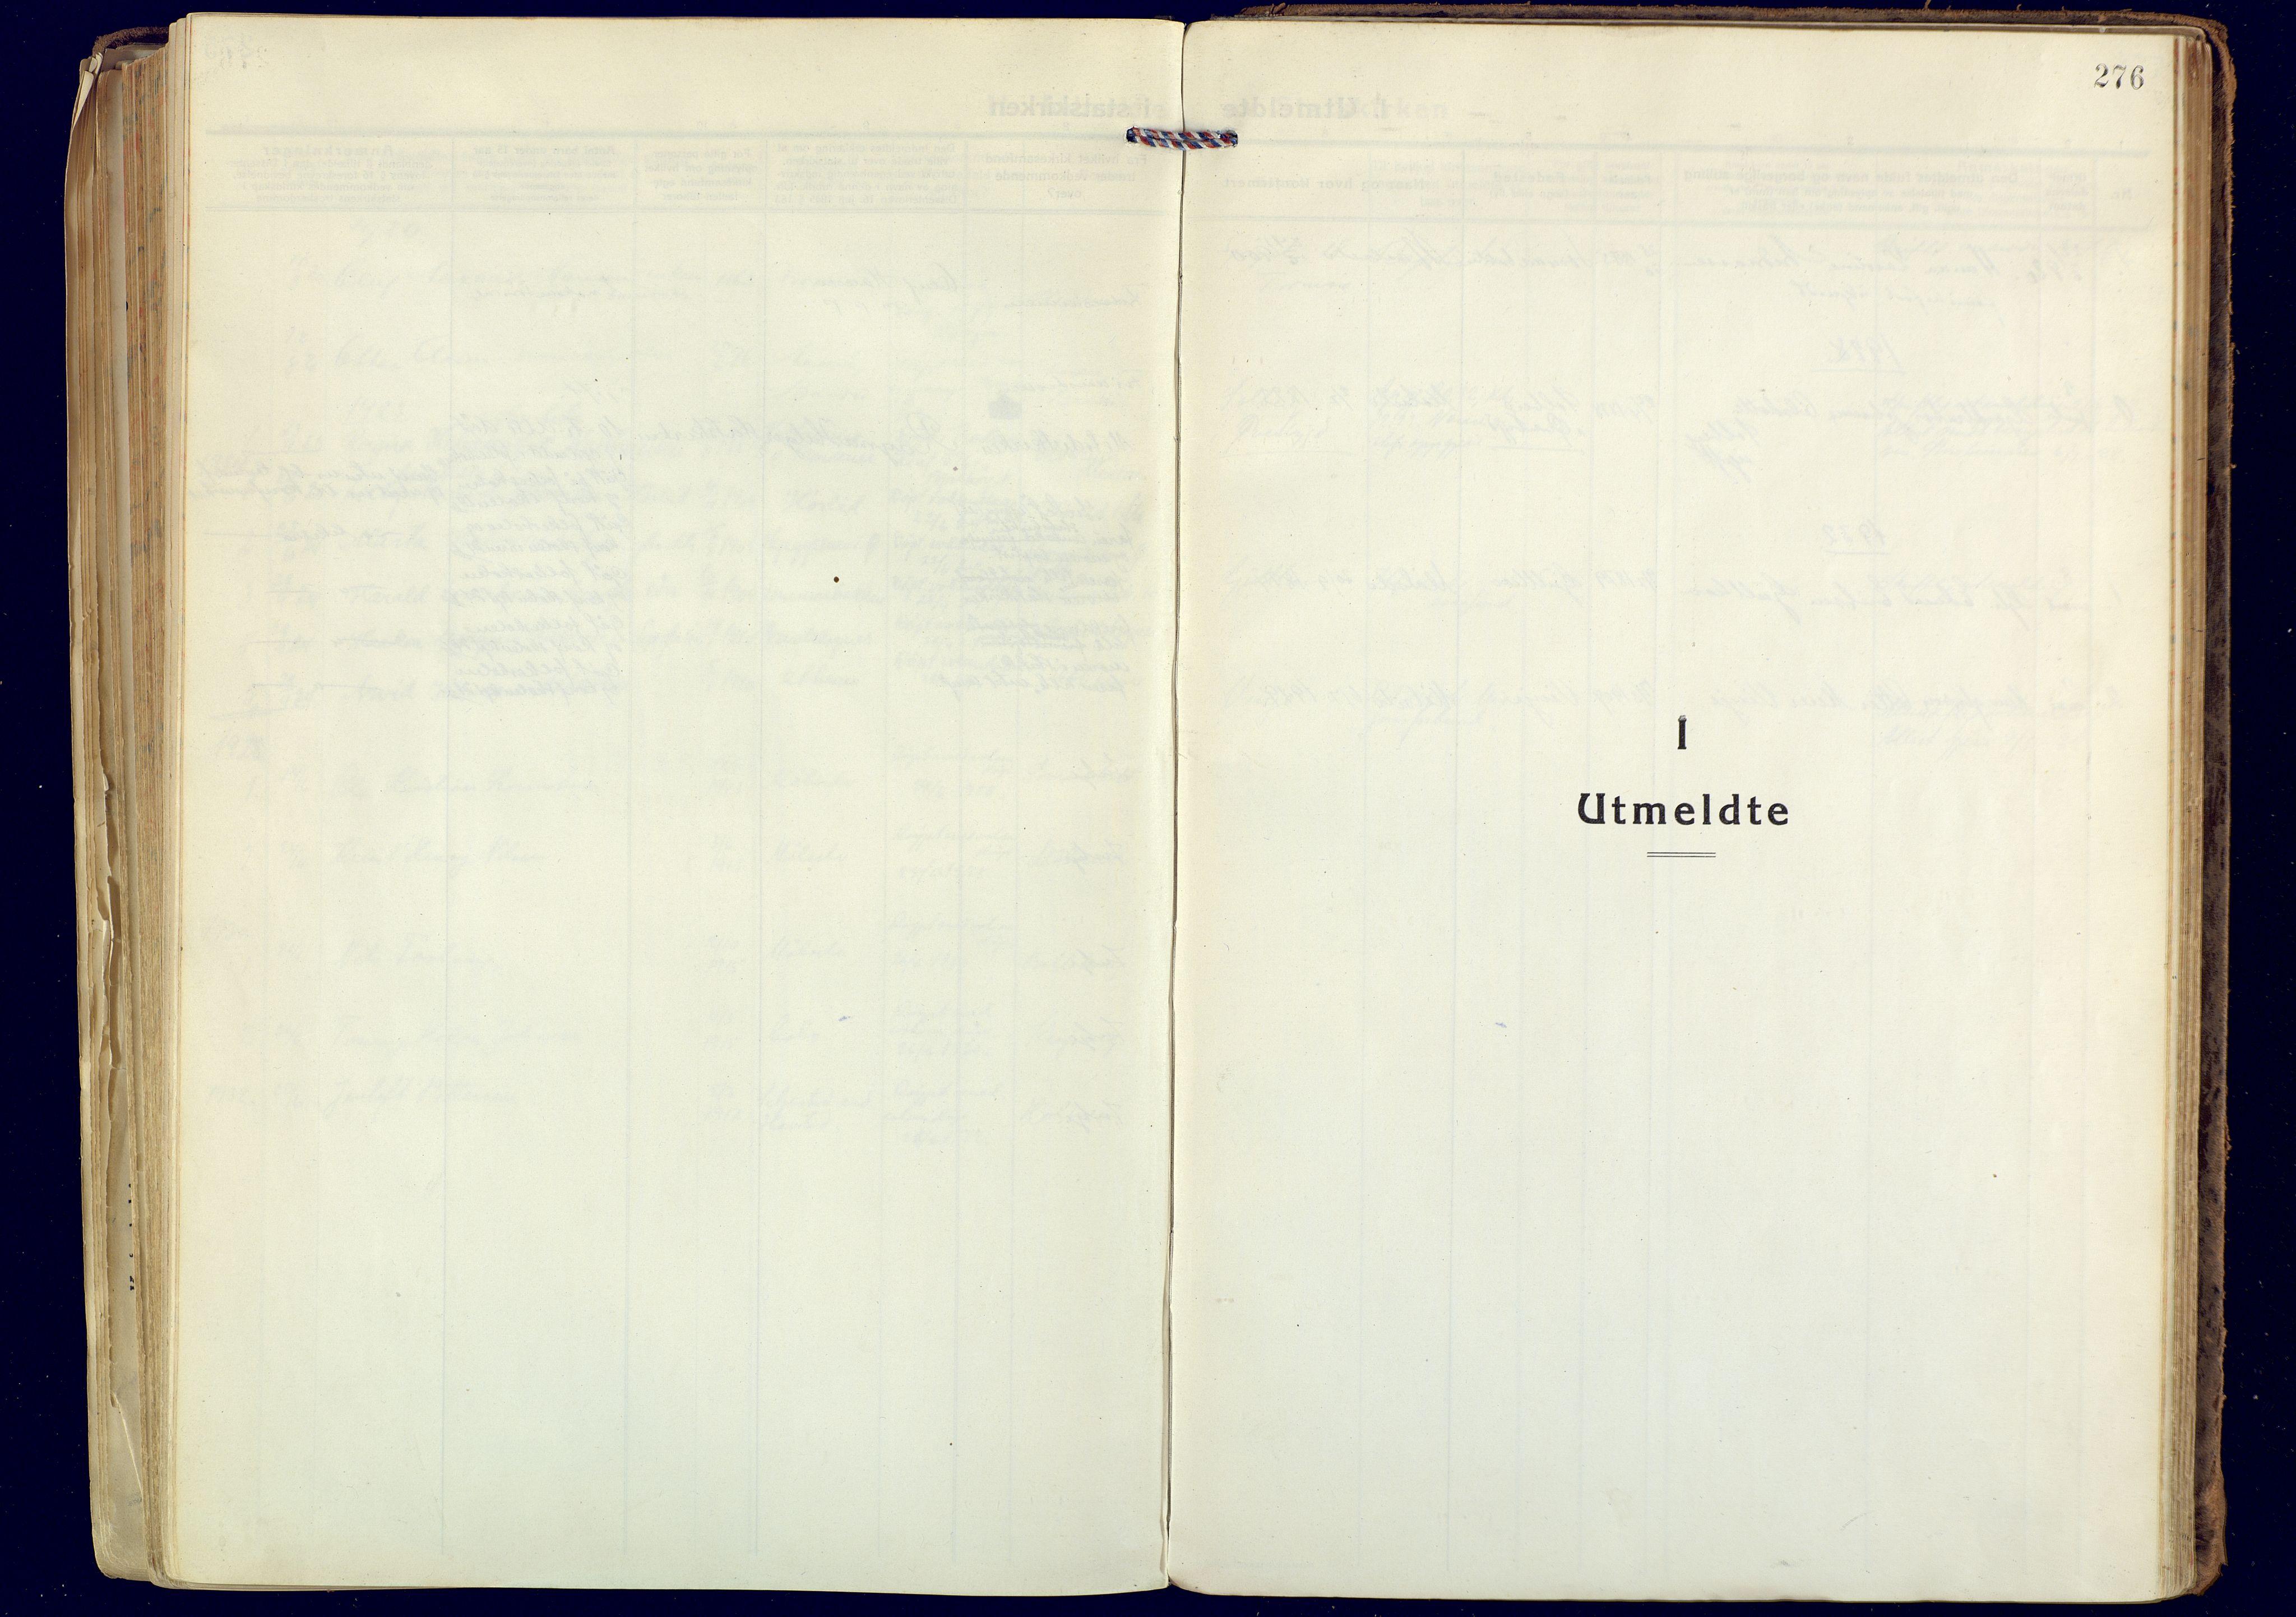 SATØ, Målselv sokneprestembete, Ministerialbok nr. 14, 1919-1932, s. 276